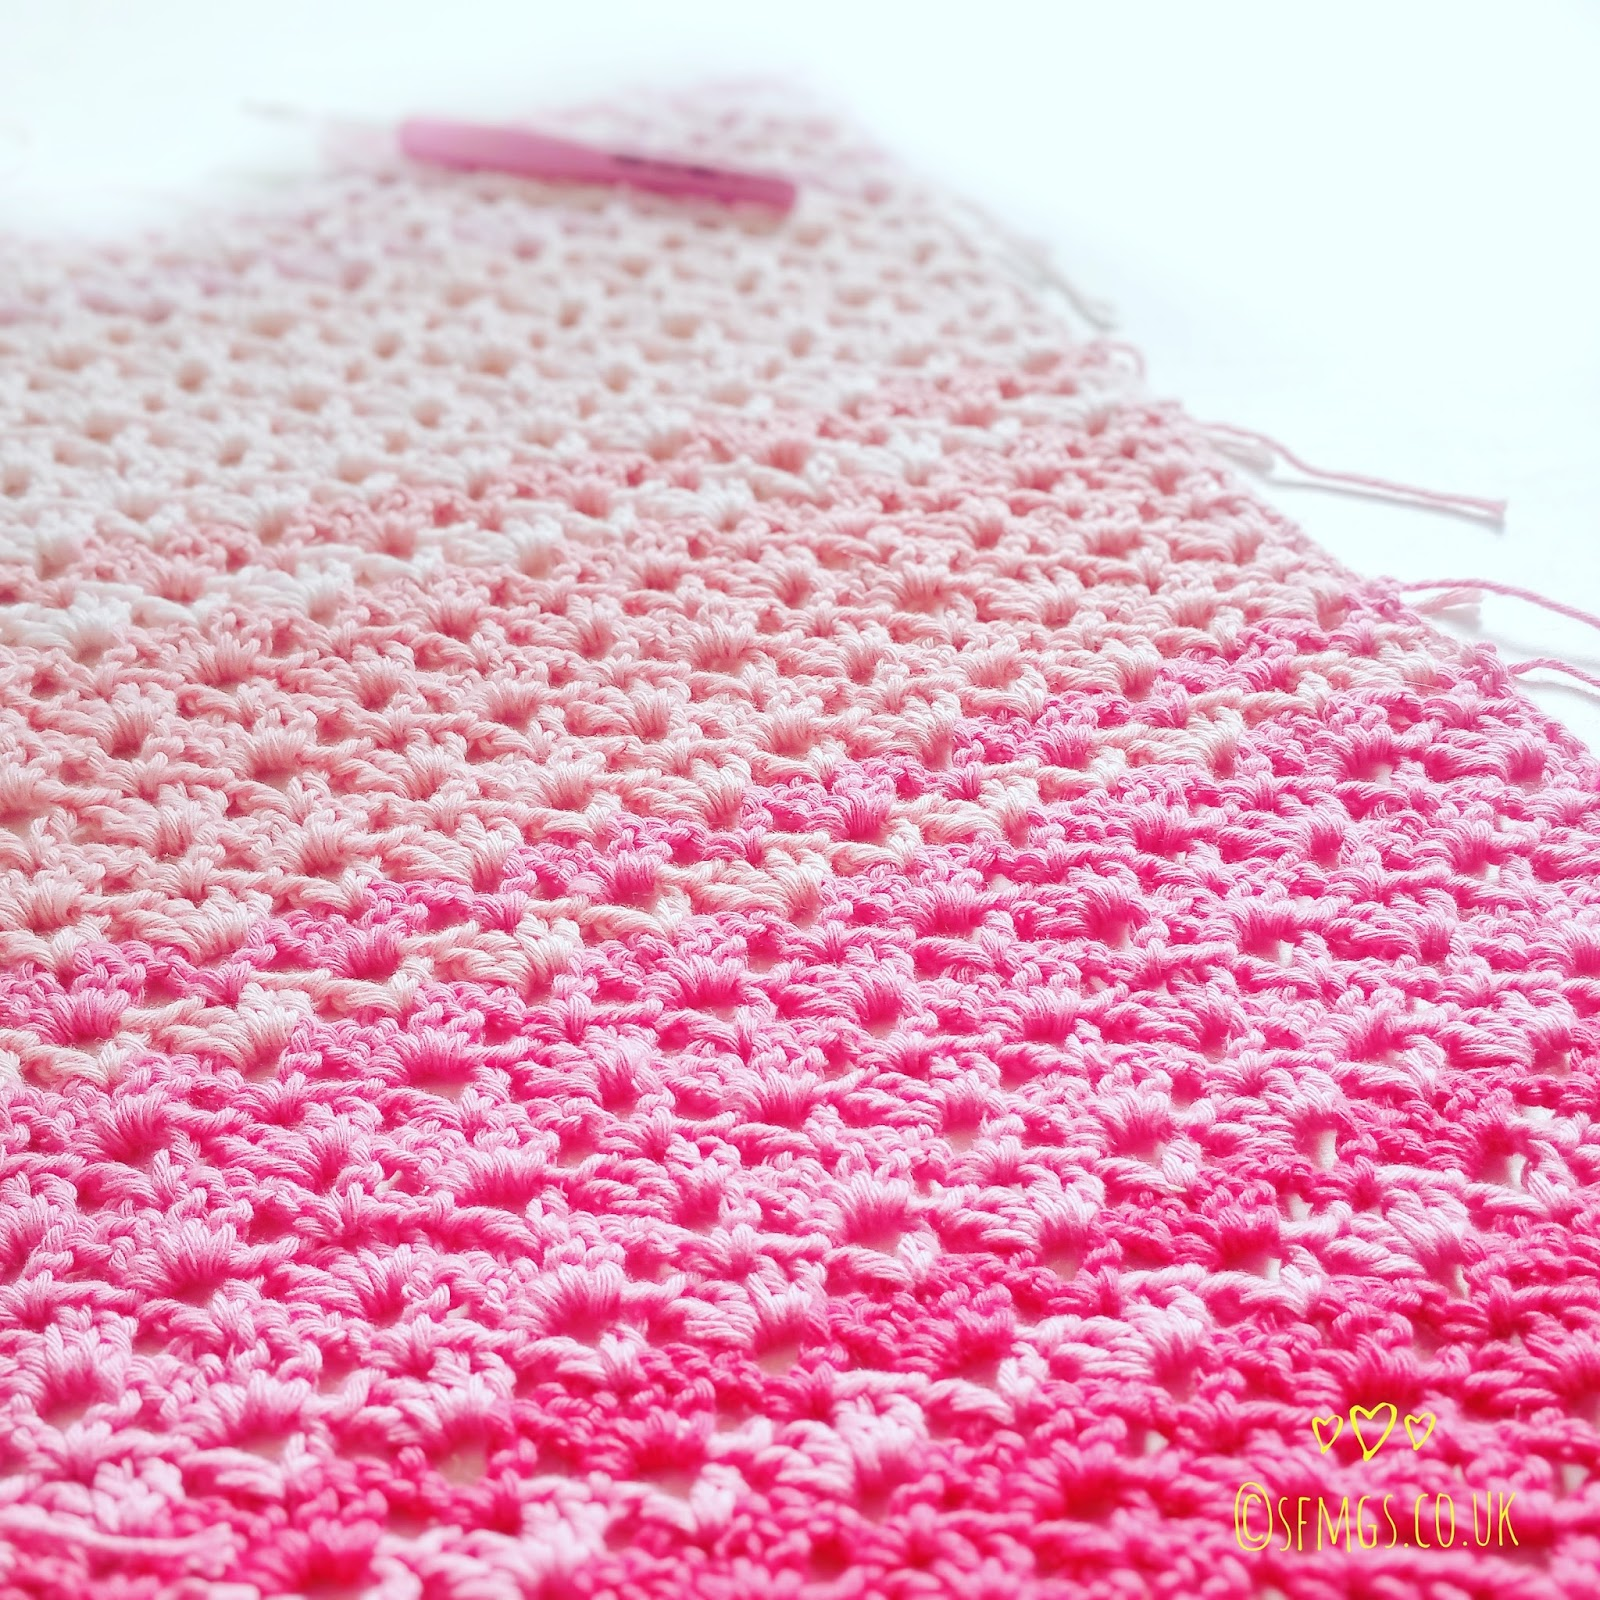 Set Free My Gypsy Soul A Crochet Craft Blog Pink Ombre Kimono Beach Cover Up Free Crochet Pattern